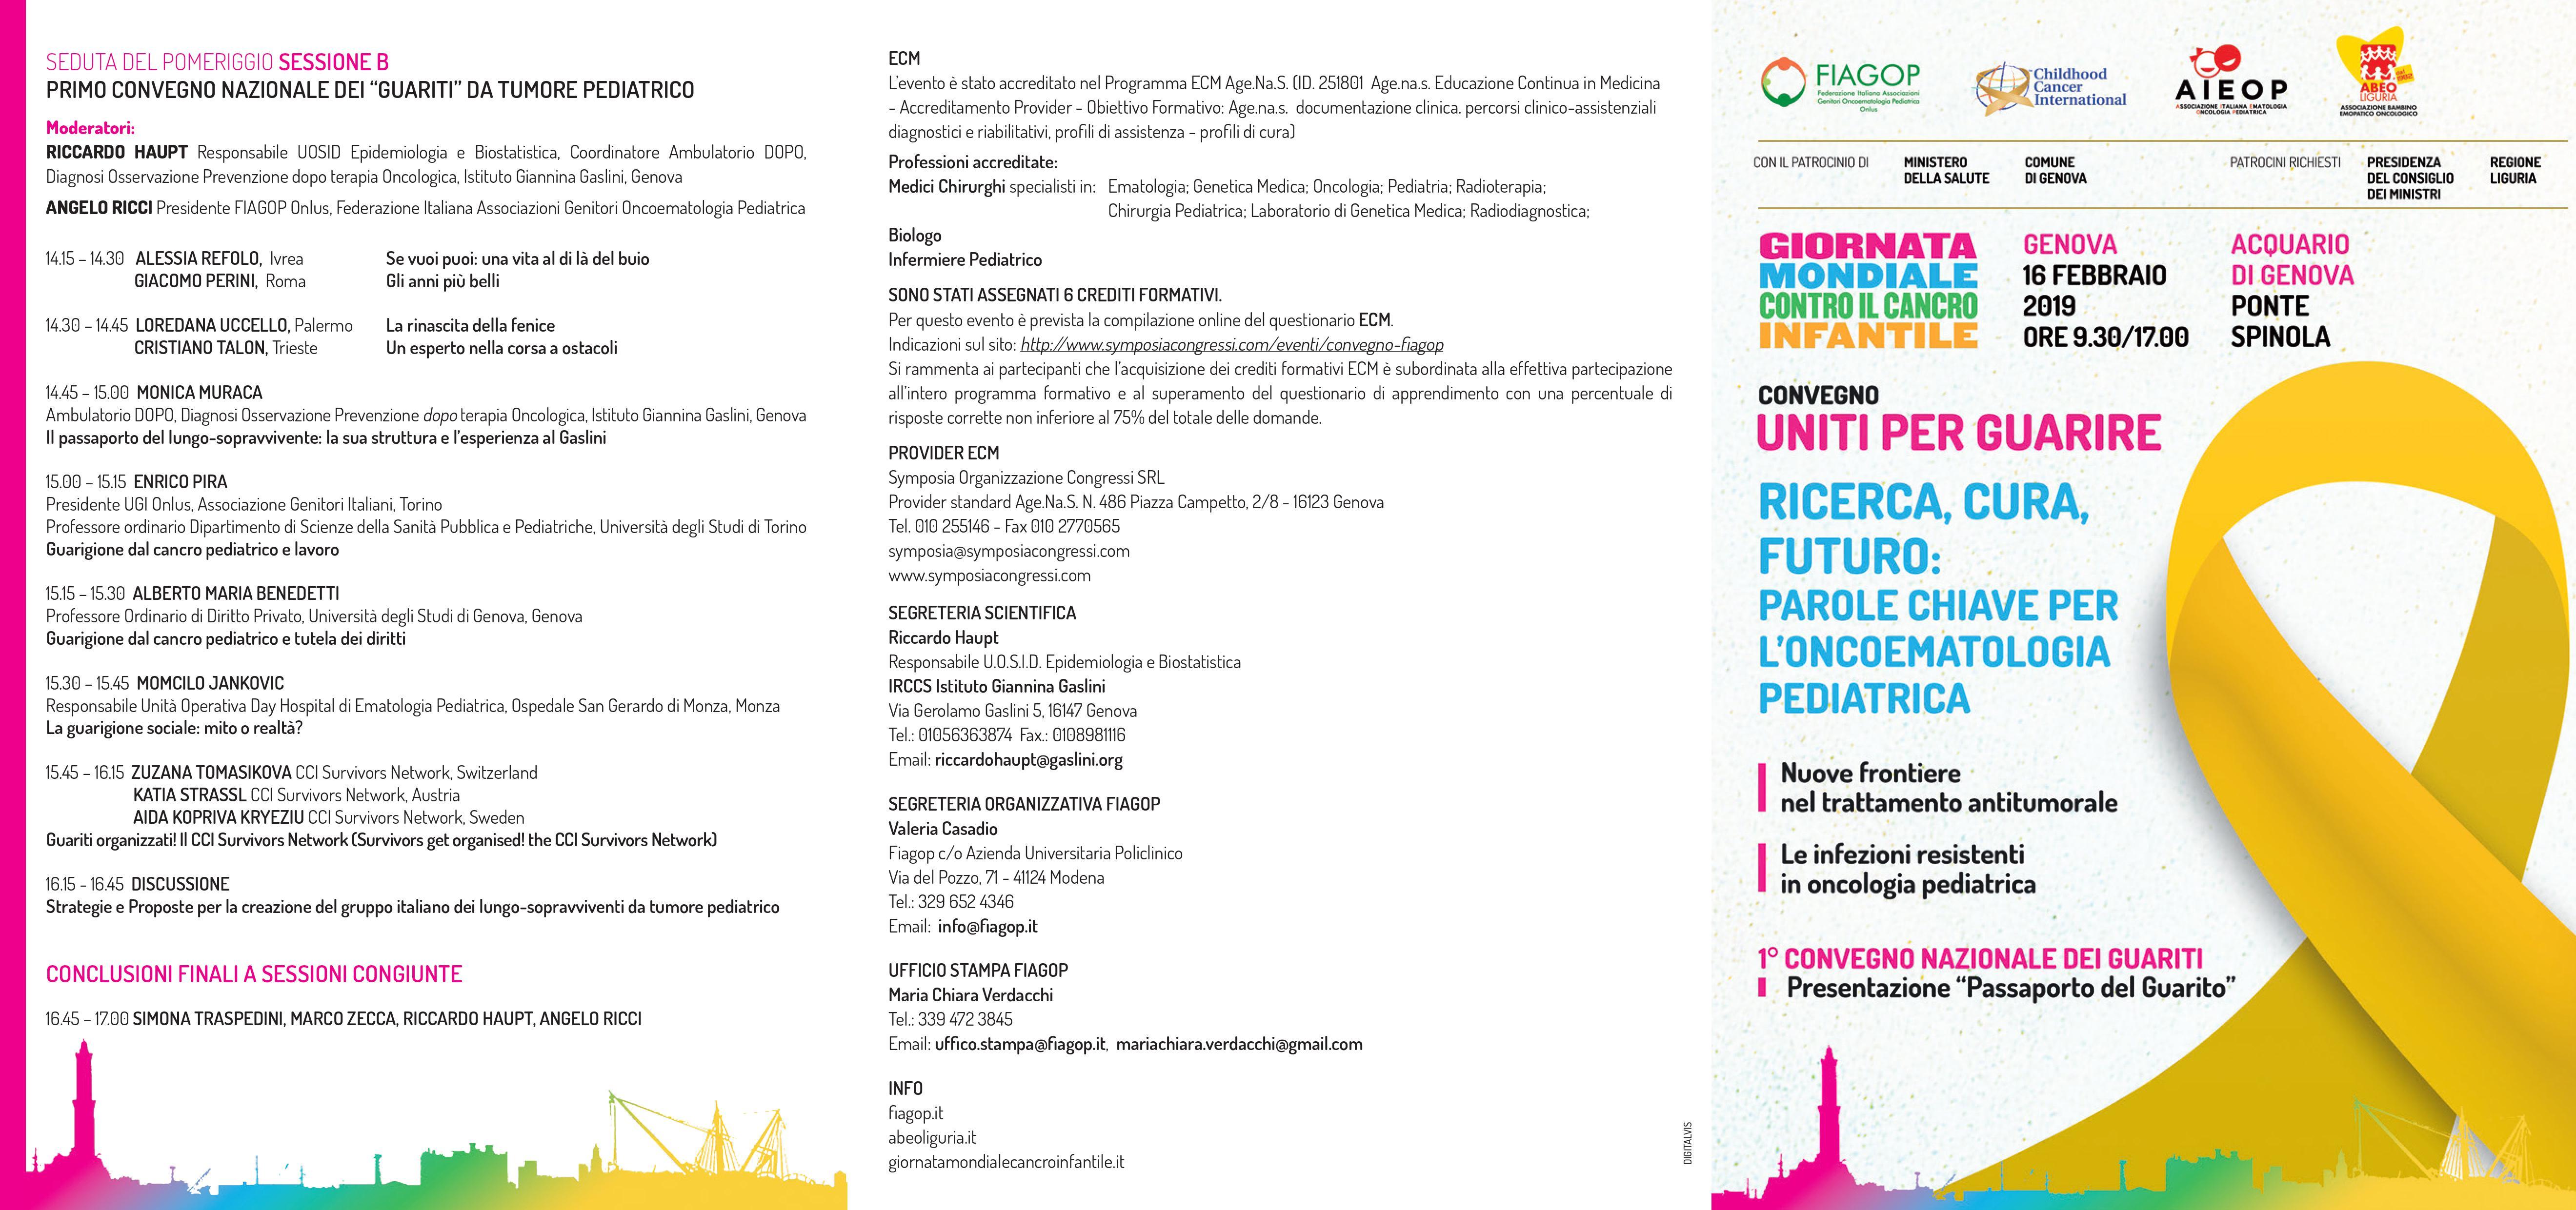 programma Convegno Genova 1